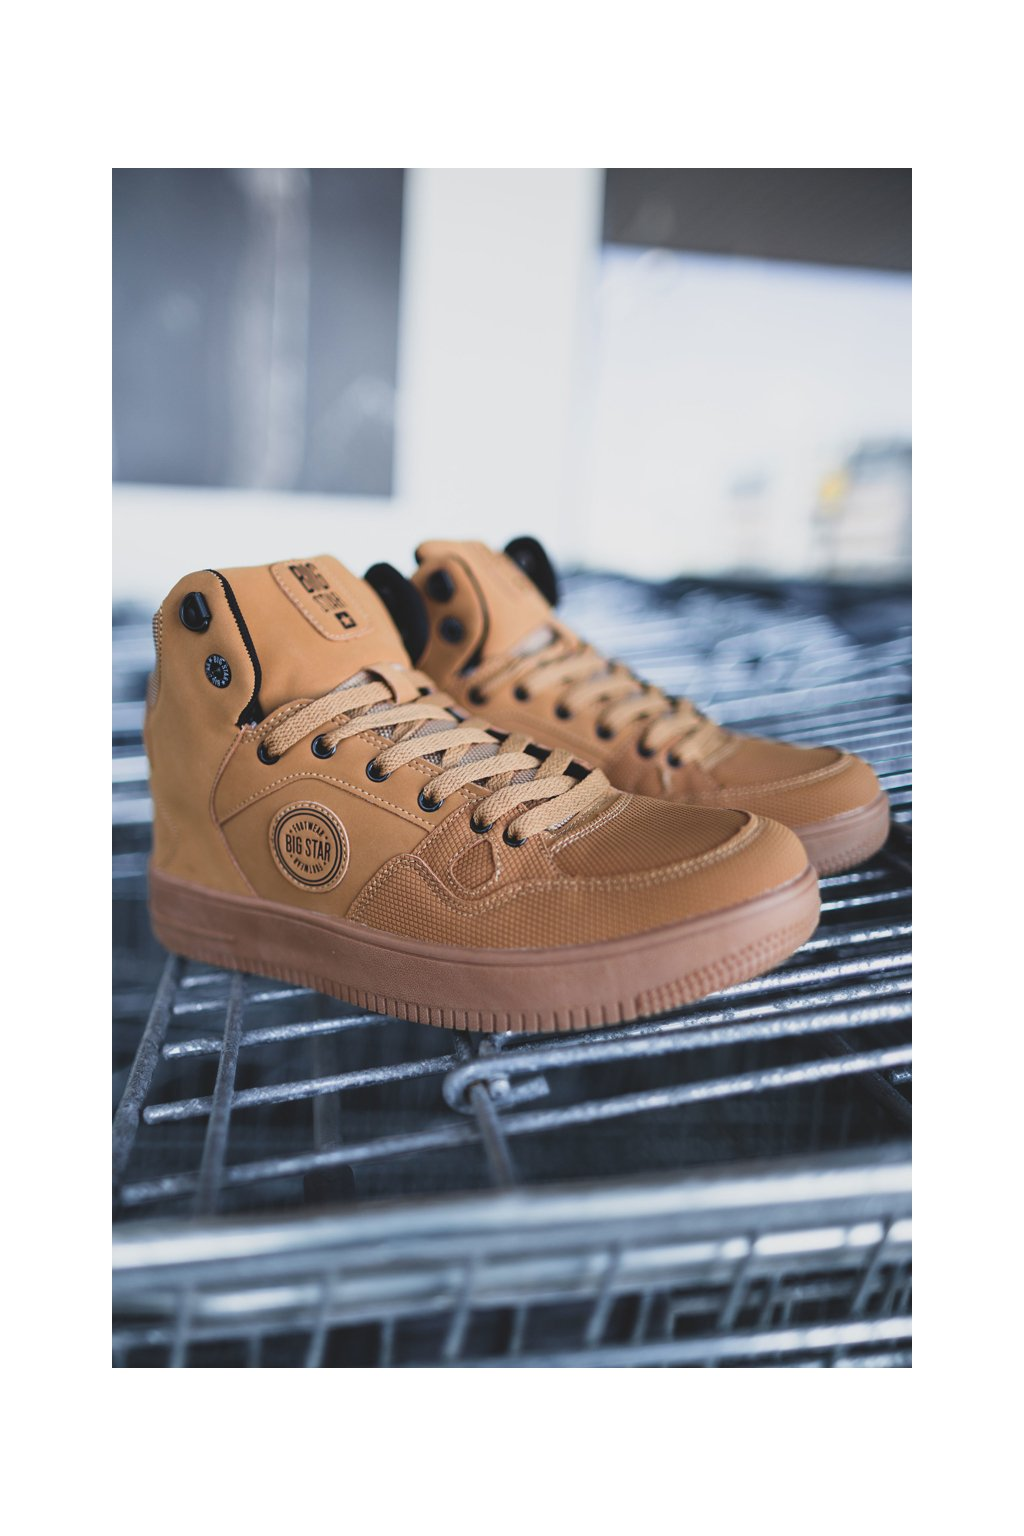 Hnedá obuv kód topánok EE174432 CAMEL